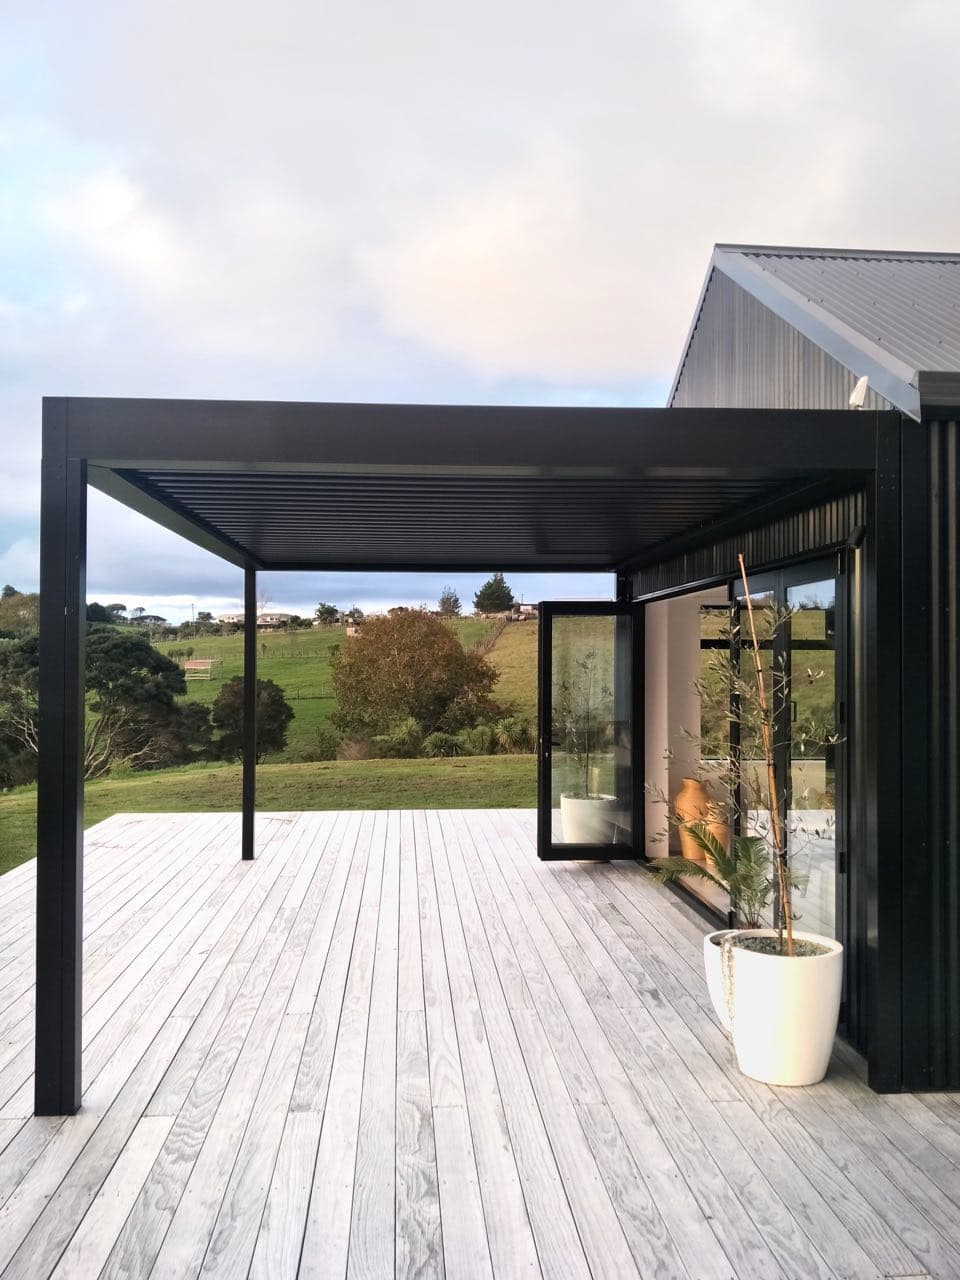 Black louvre against black house covering deck